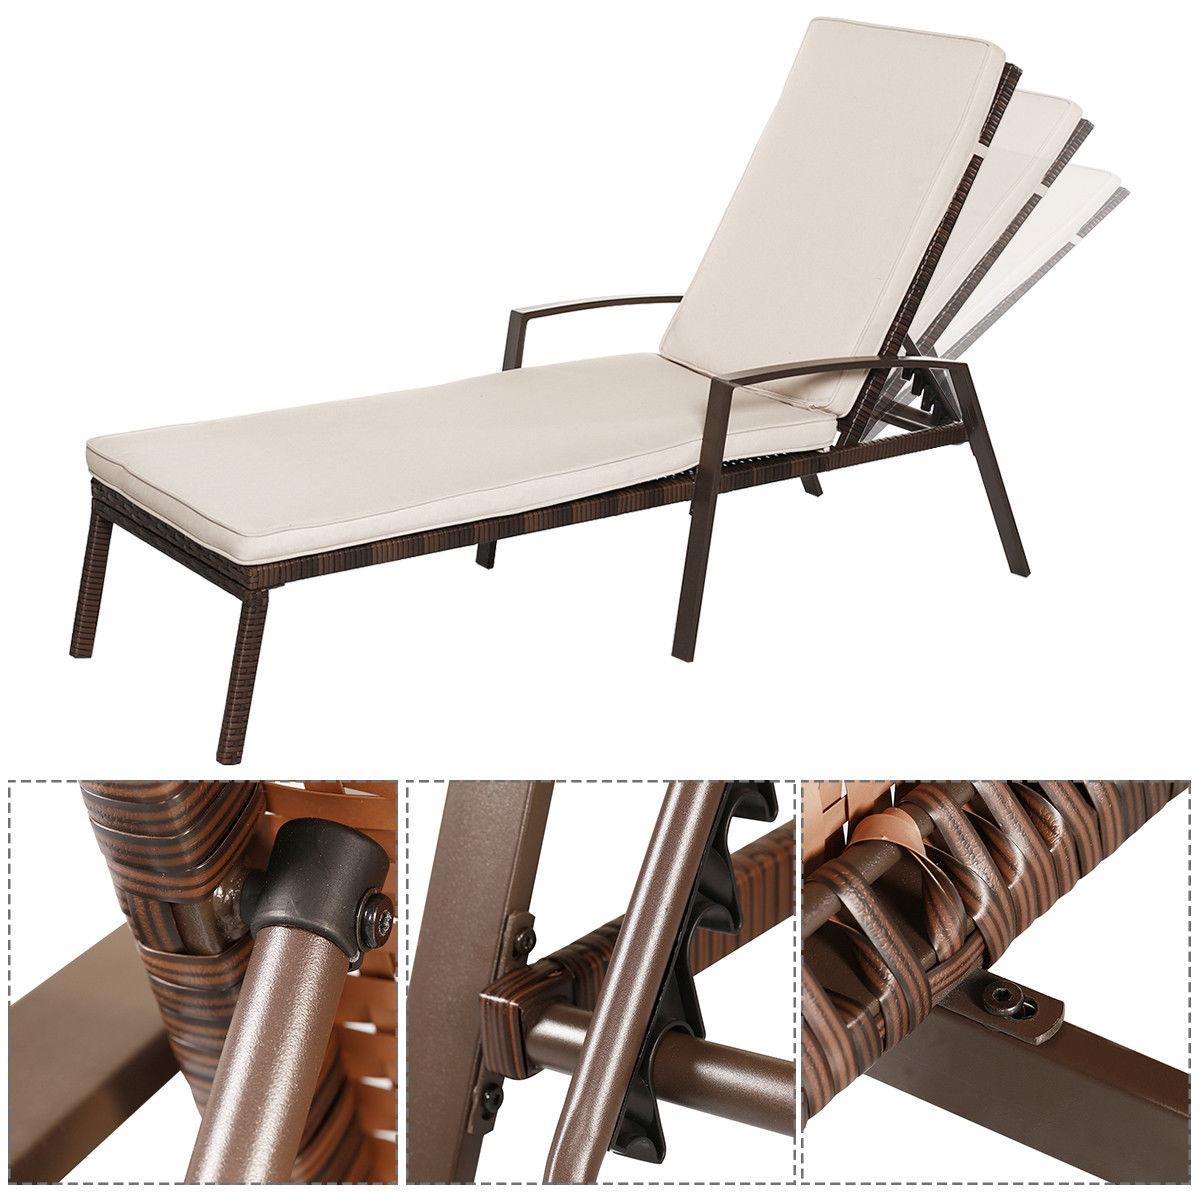 2pcs Patio Rattan Lounge Chair Garden Furniture Adjustable Back W/ Cushion - image 7 of 10